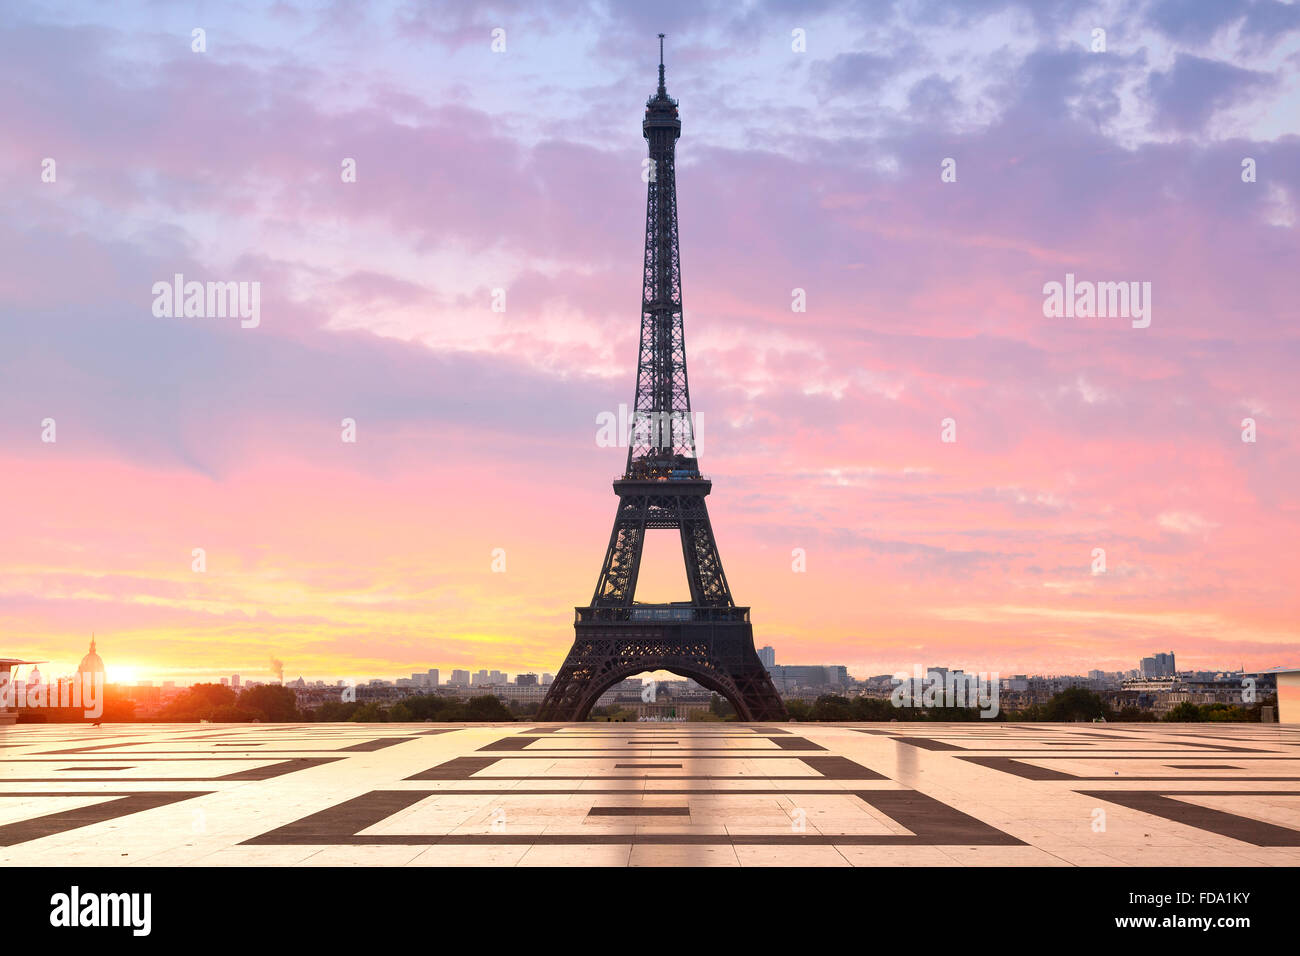 Paris, Eiffel tower at sunrise - Stock Image